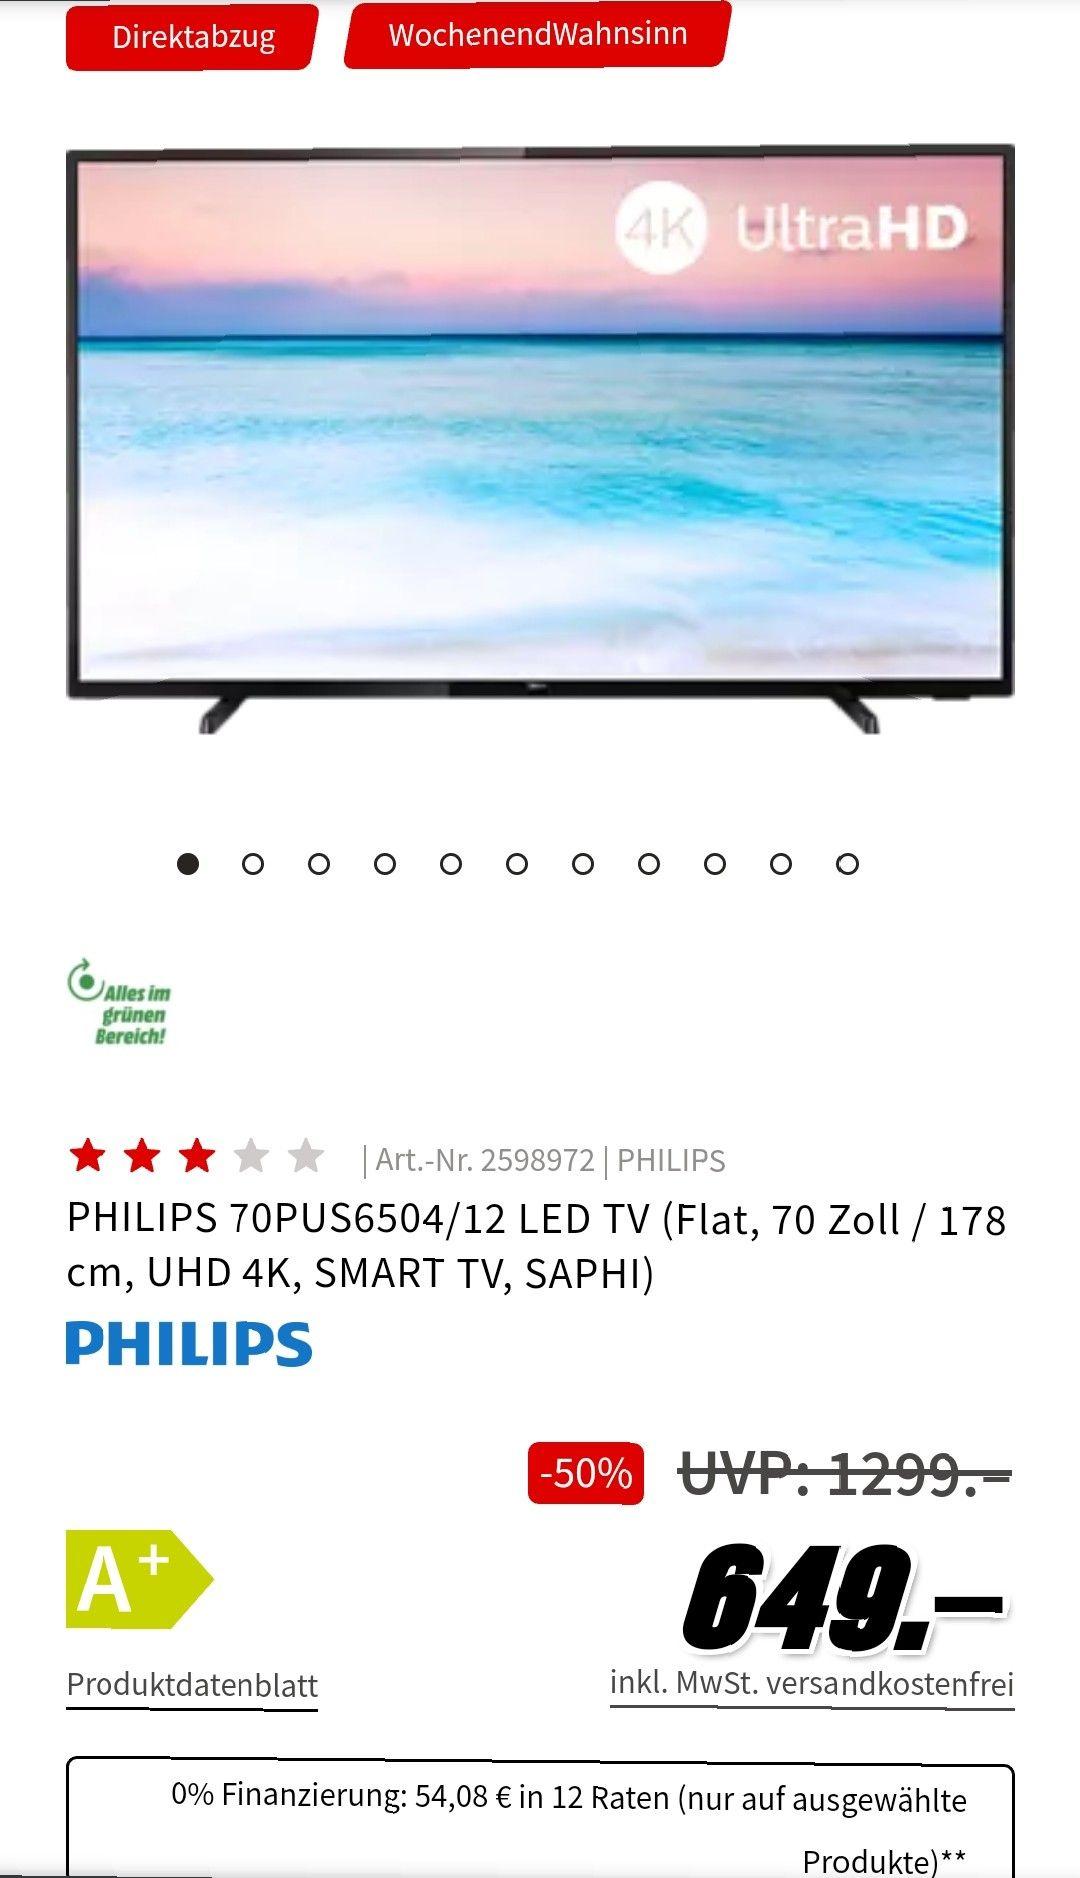 PHILIPS 70PUS6504/12 LED TV (Flat, 70 Zoll / 178 cm, UHD 4K, SMART TV, SAPHI)